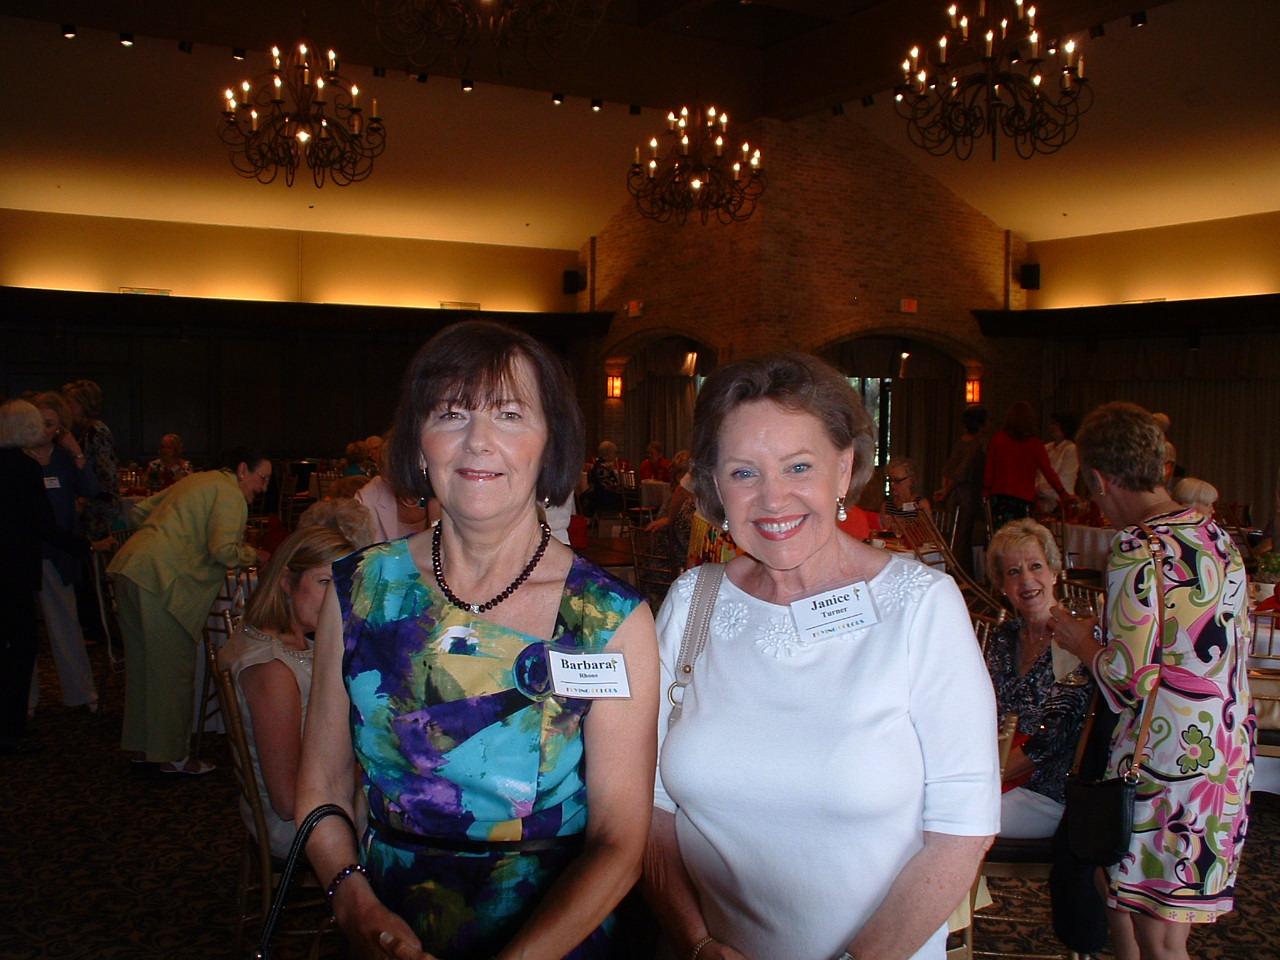 Barbara Rhone & Janice Turner